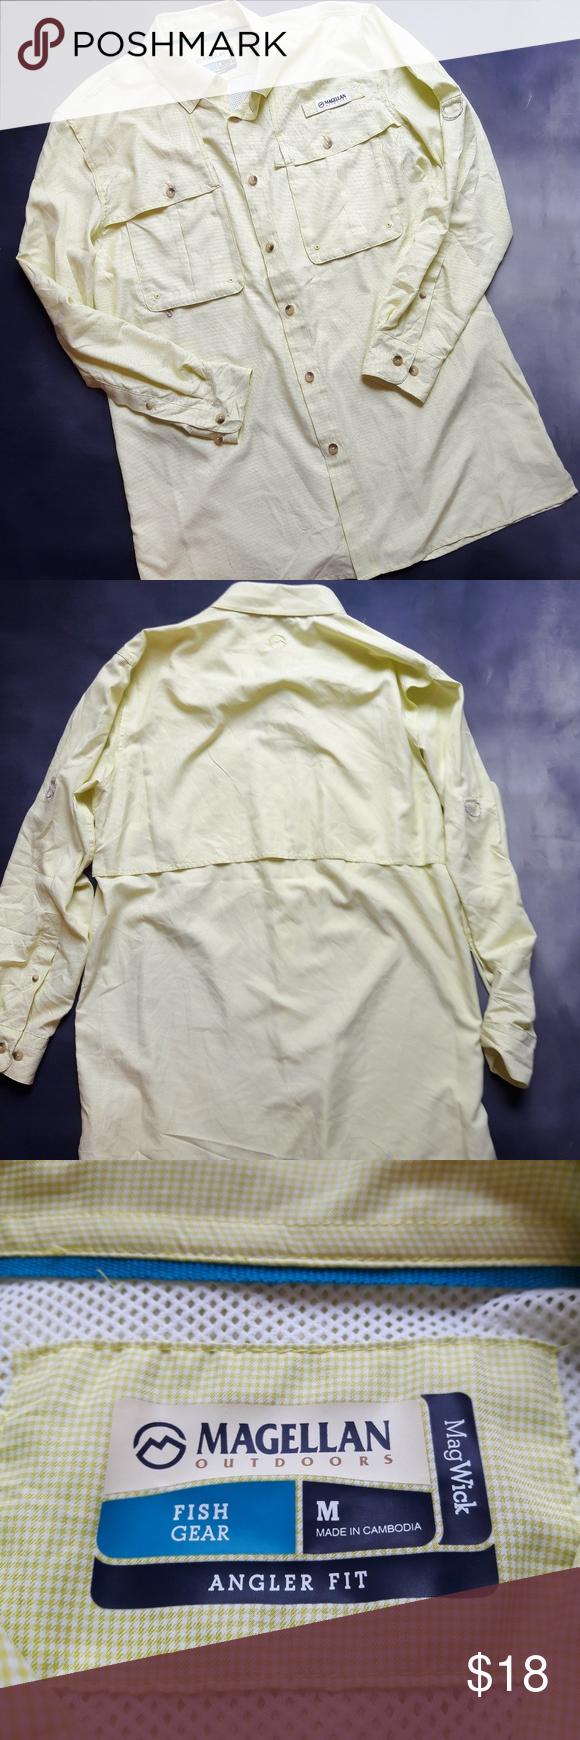 magellan angler fit shirt - 580×1740